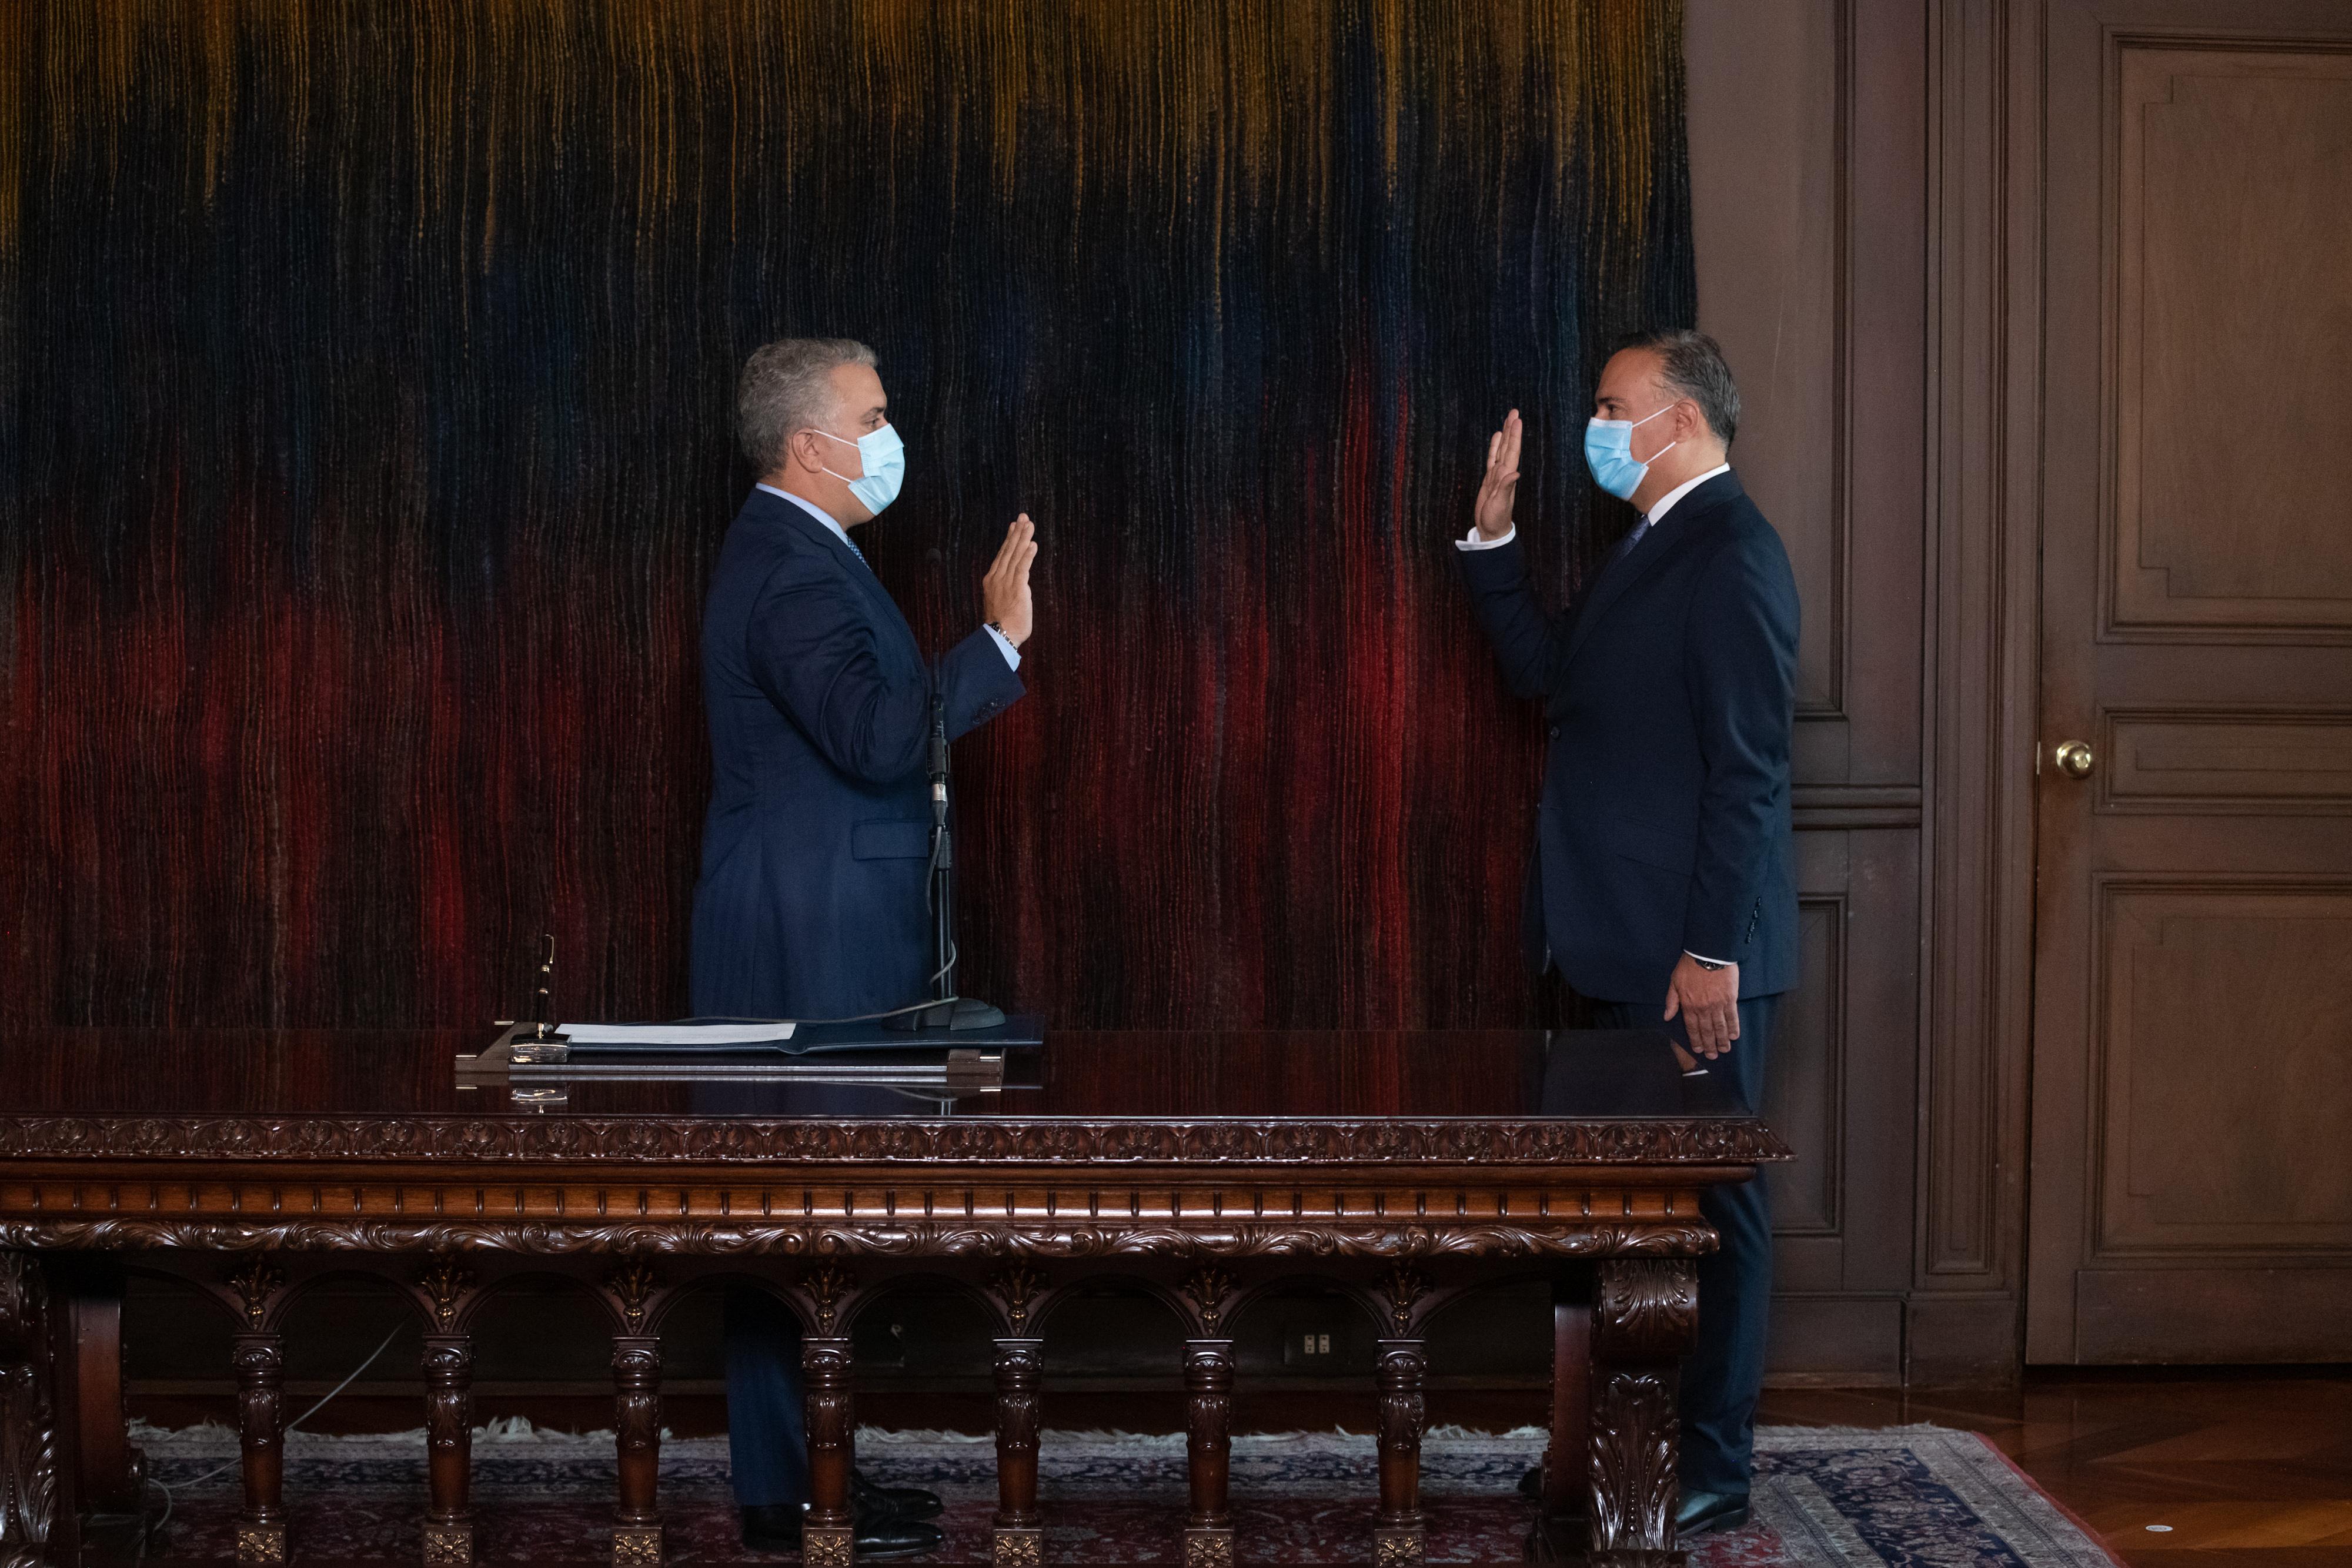 Presidente Iván Duque posesionó a Luis Guillermo Plata como nuevo Embajador de Colombia en España